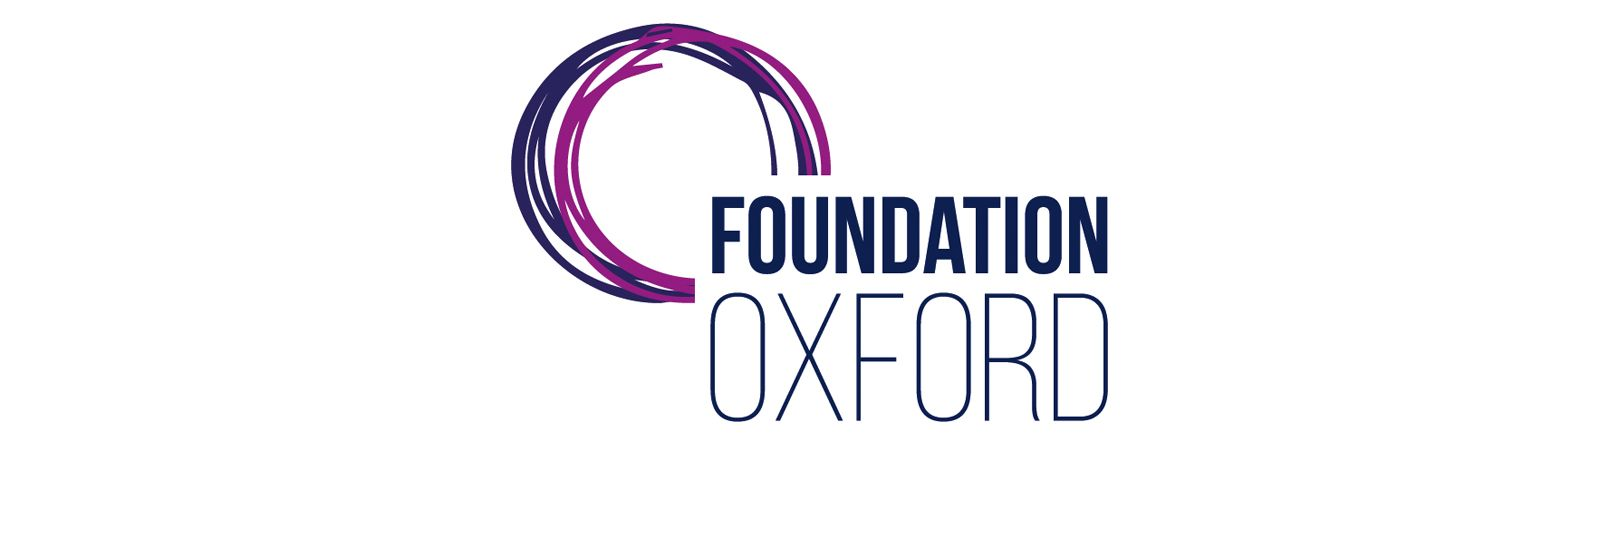 Foundation Oxford logo